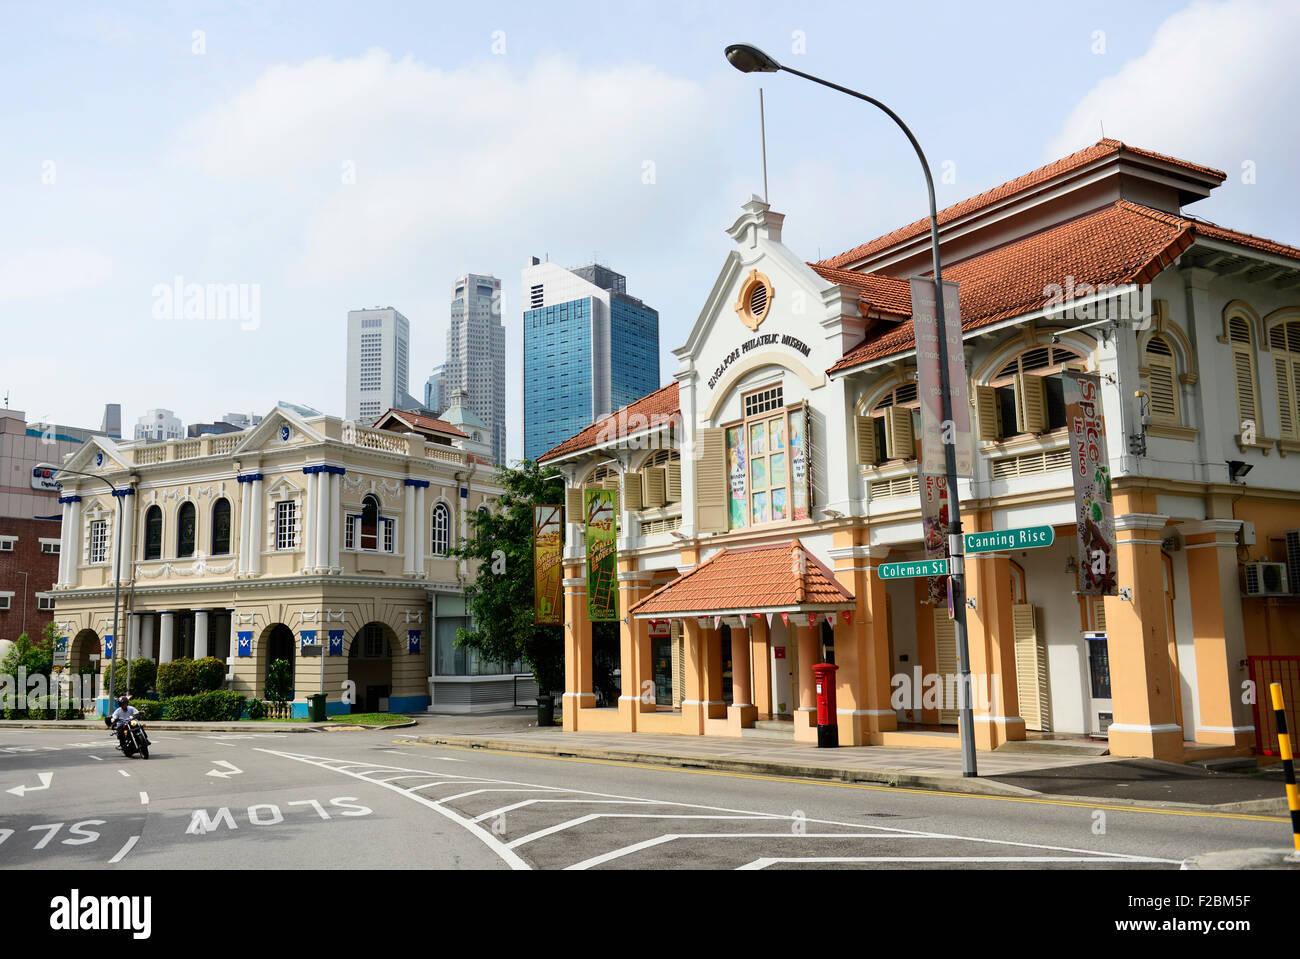 The beautiful building housing the Singapore philatelic museum. - Stock Image